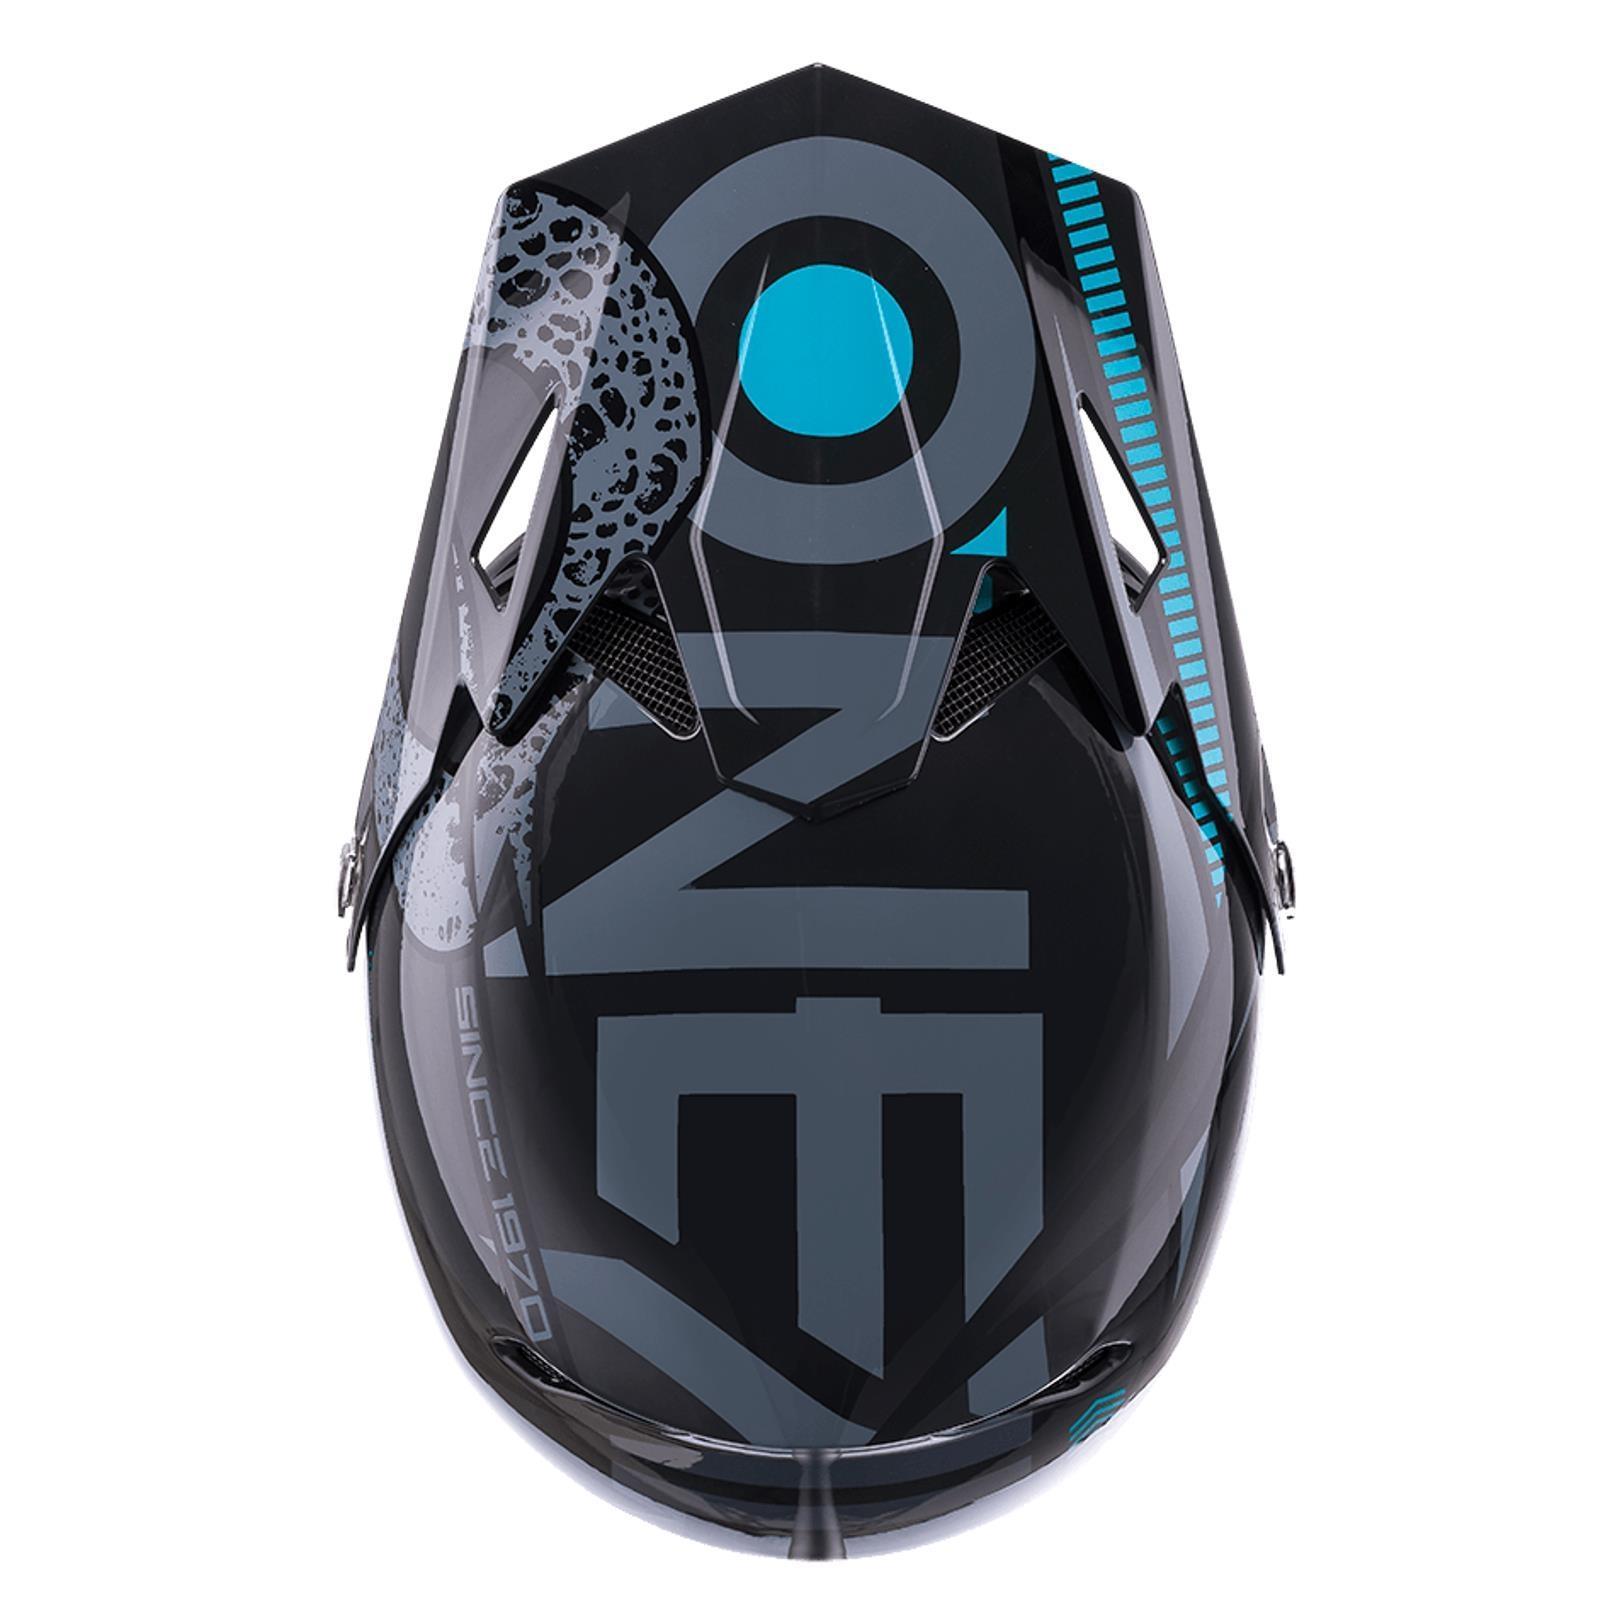 Indexbild 20 - ONeal-Sonus-Strike-Fahrrad-Helm-All-Mountain-Bike-MTB-Downhill-Fullface-Fidlock